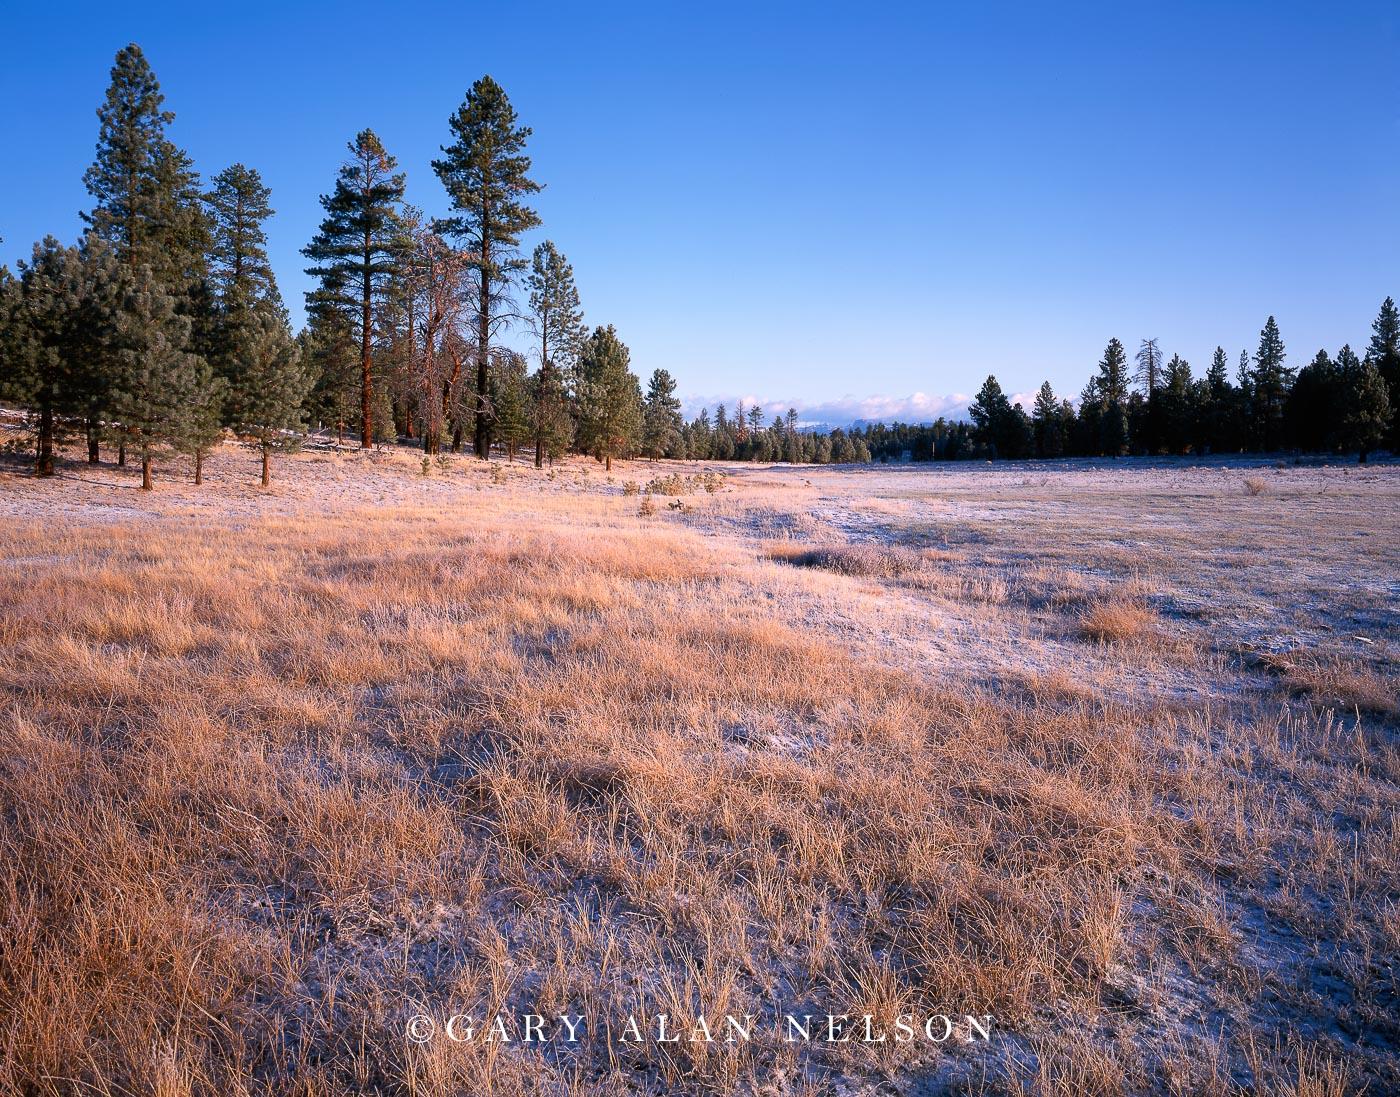 Bryce Canyon National Park, Utah, prairie grass, pines, photo